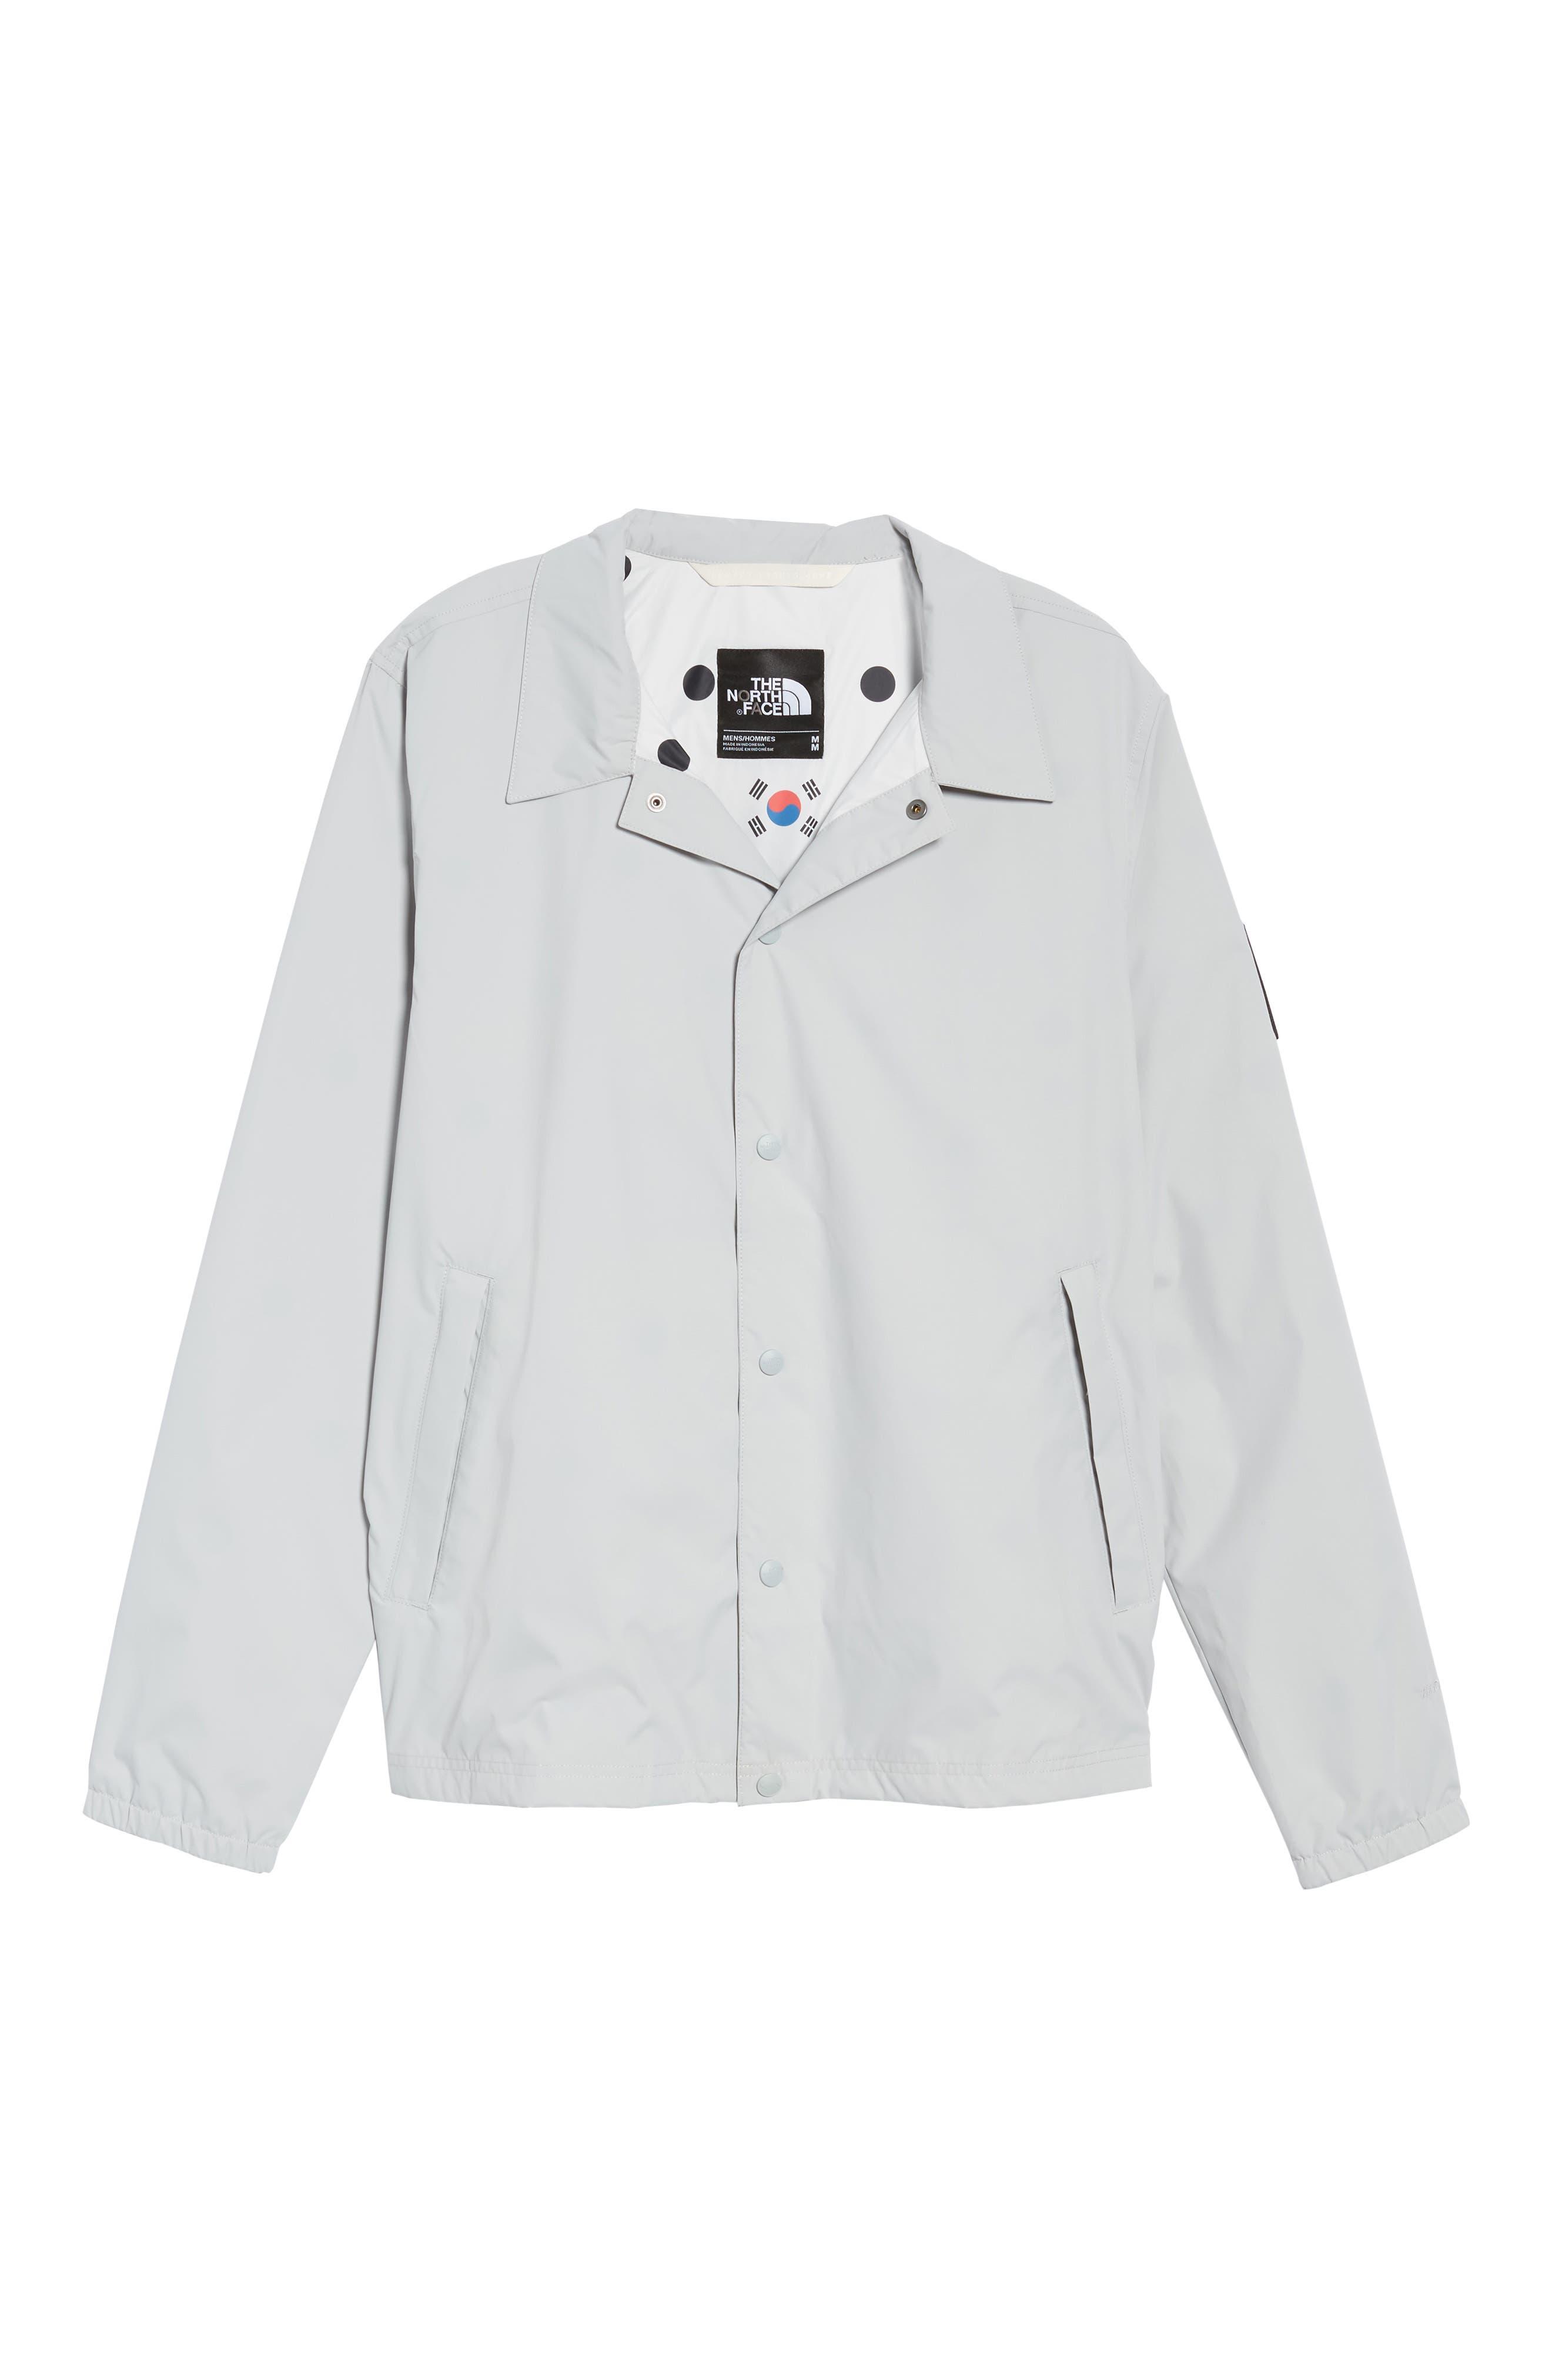 International Collection Coach Jacket,                             Alternate thumbnail 14, color,